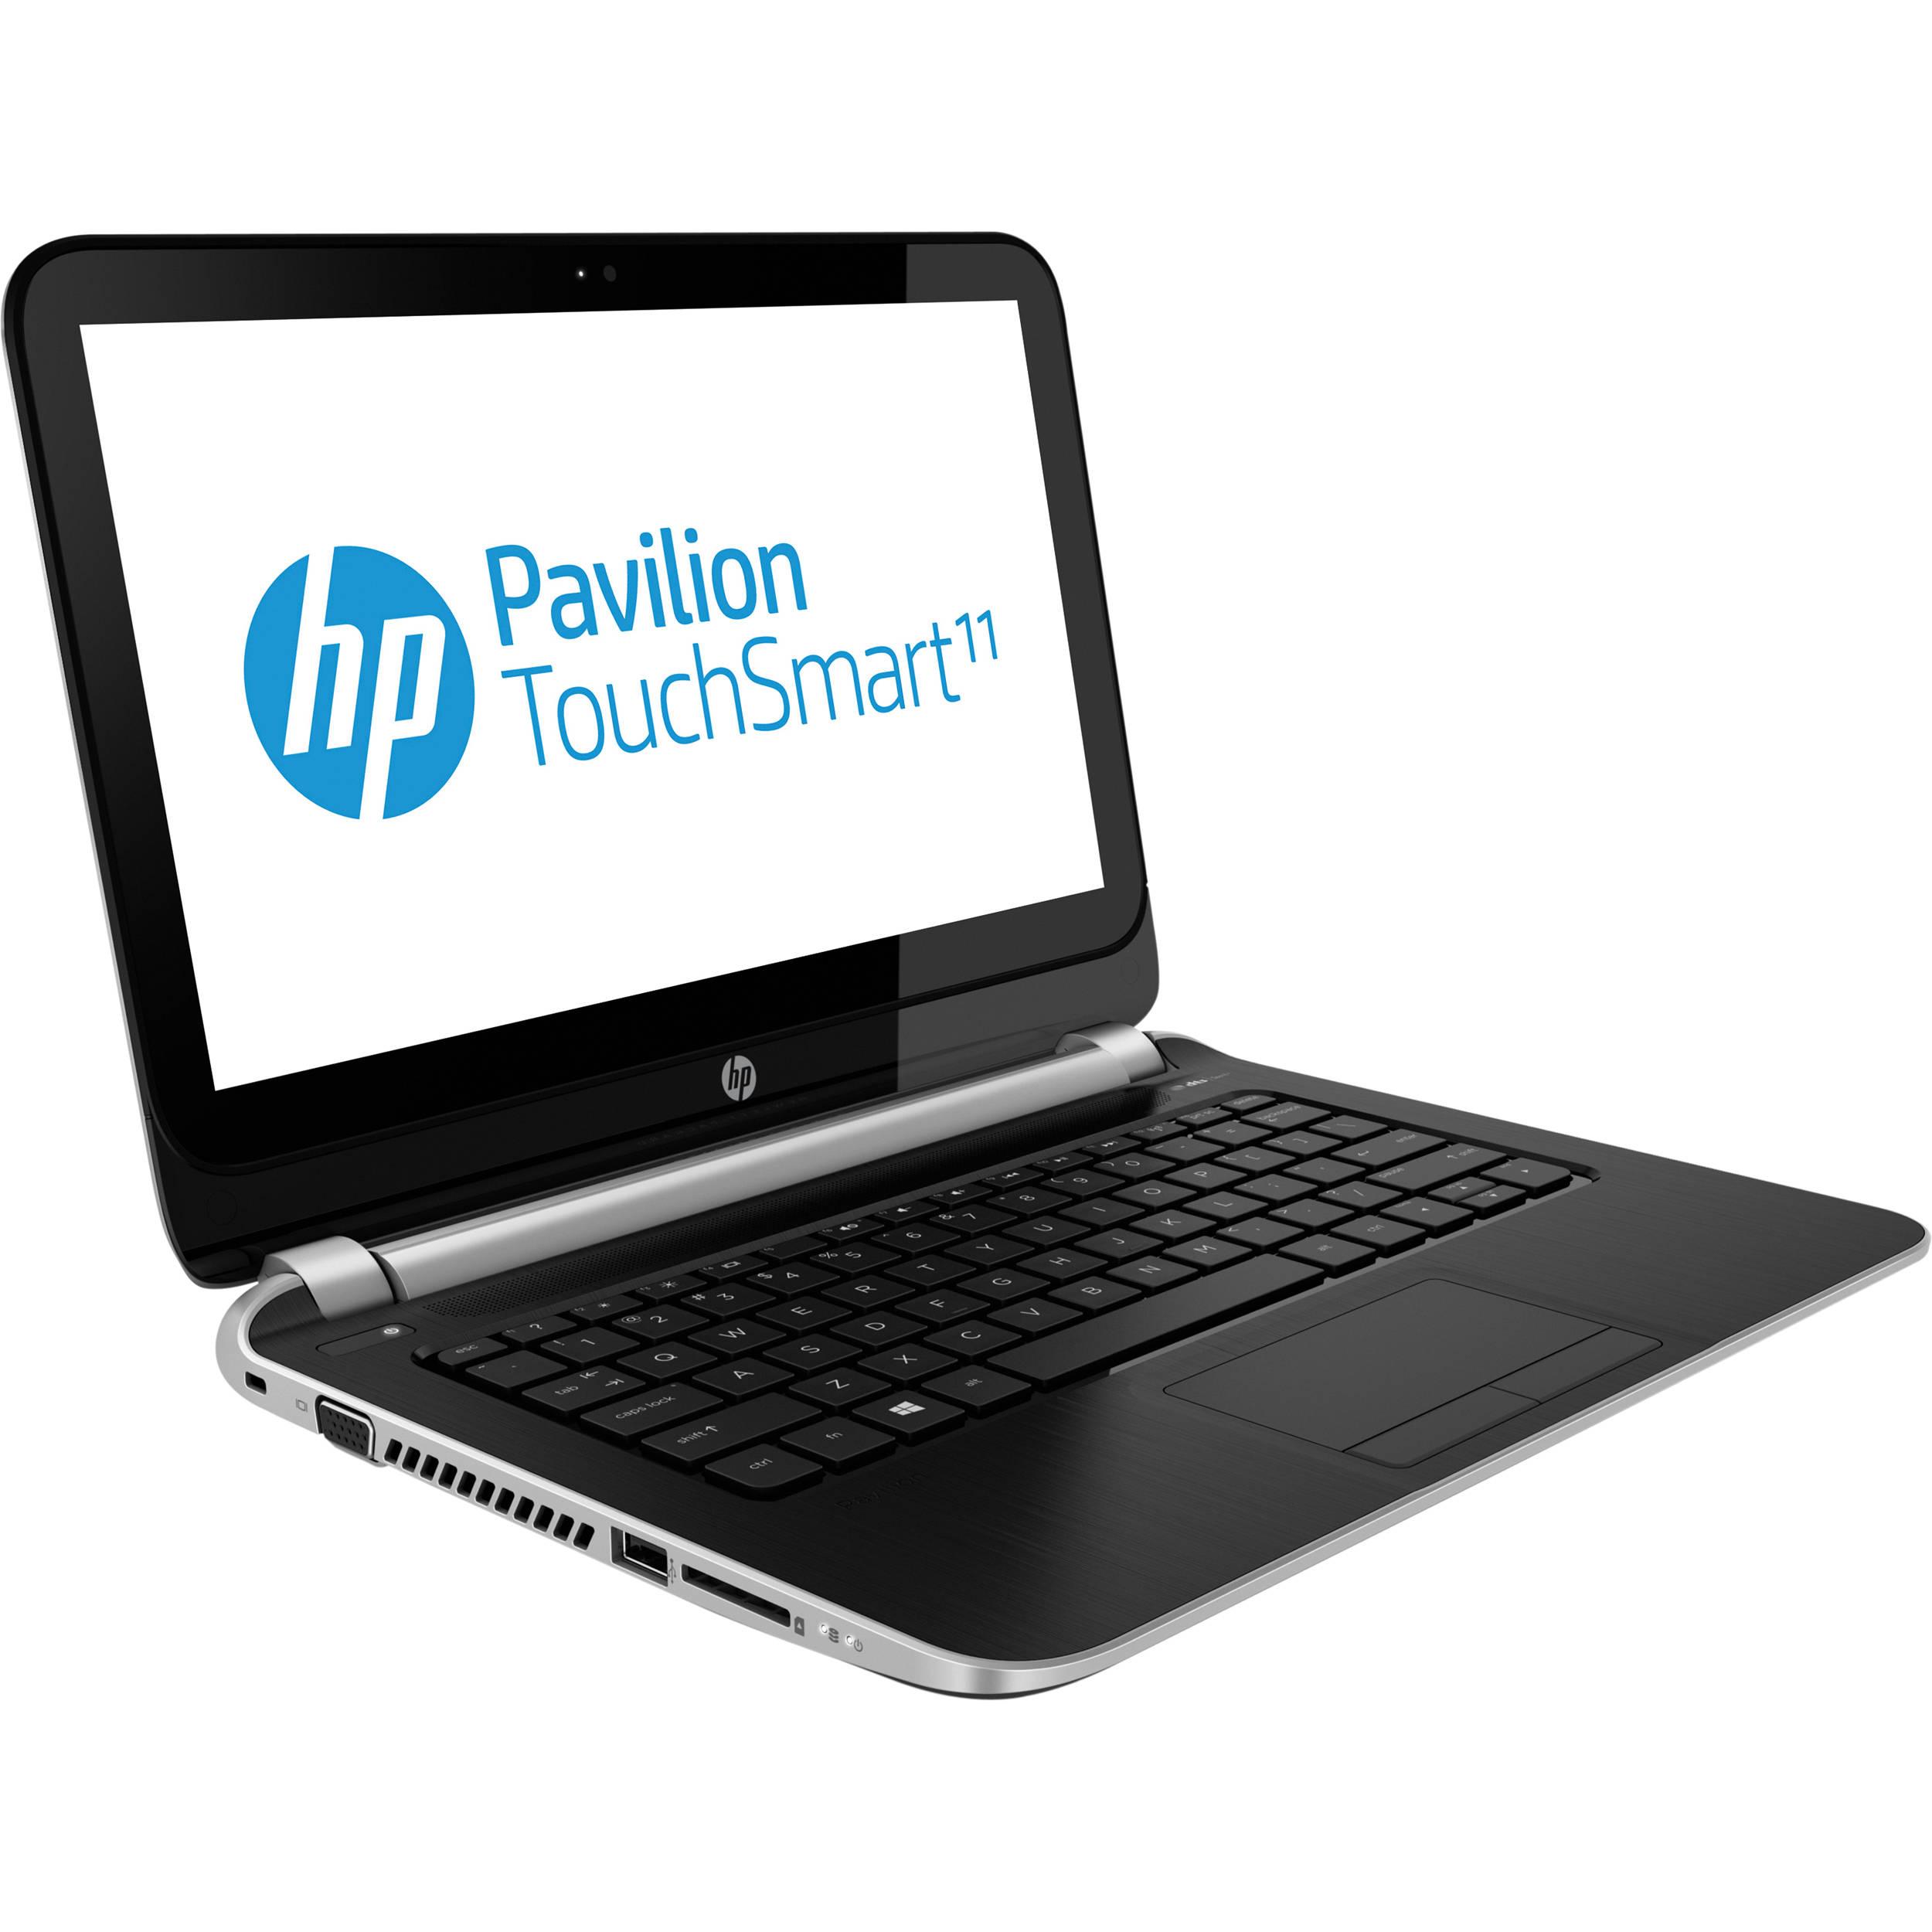 HP PAVILION 10-E010NR SYSTEM DRIVER PC